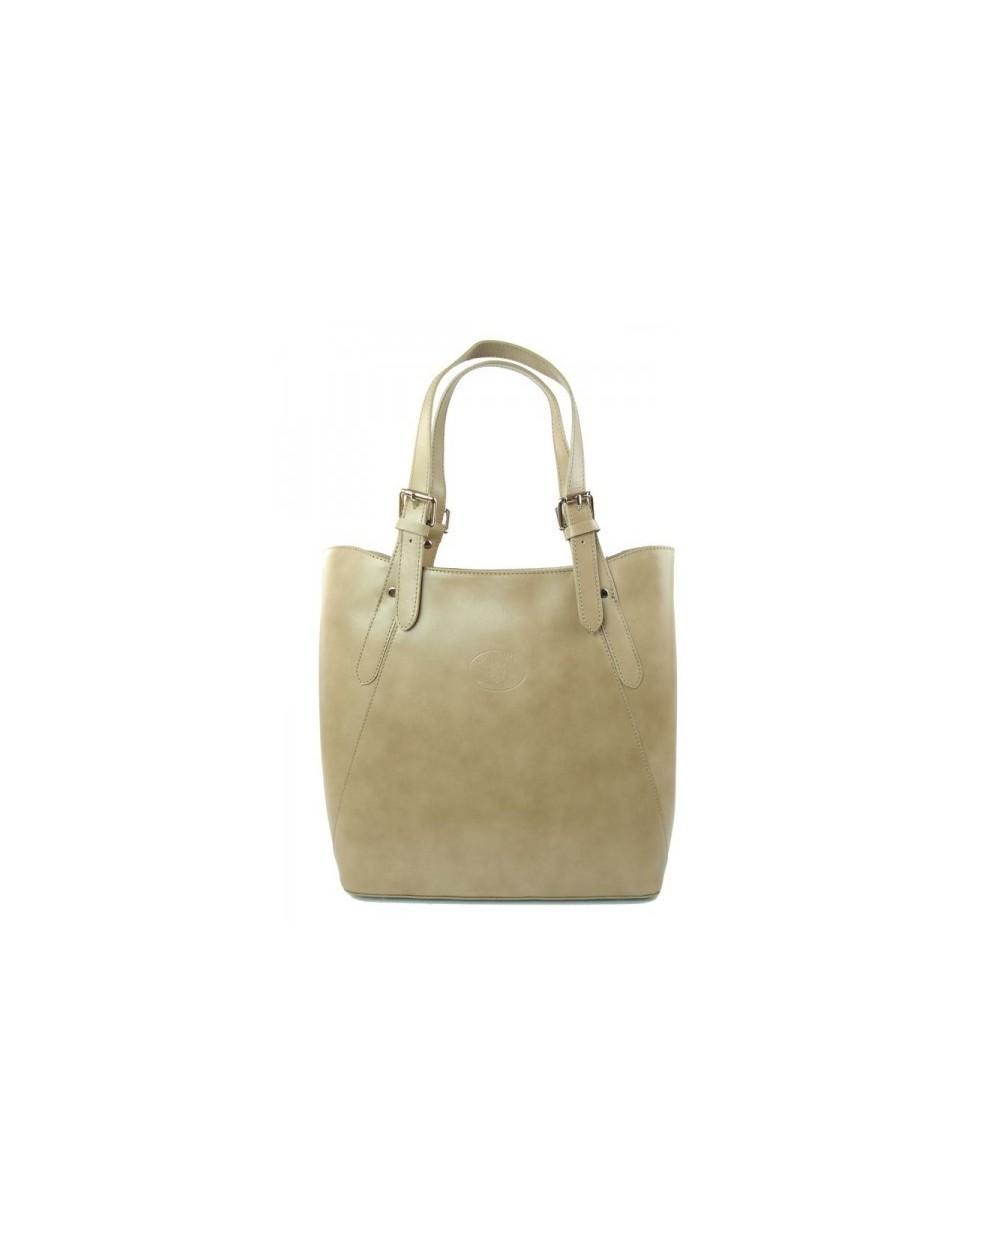 Shopper bag włoska torebka skórzana A4 Beżowa